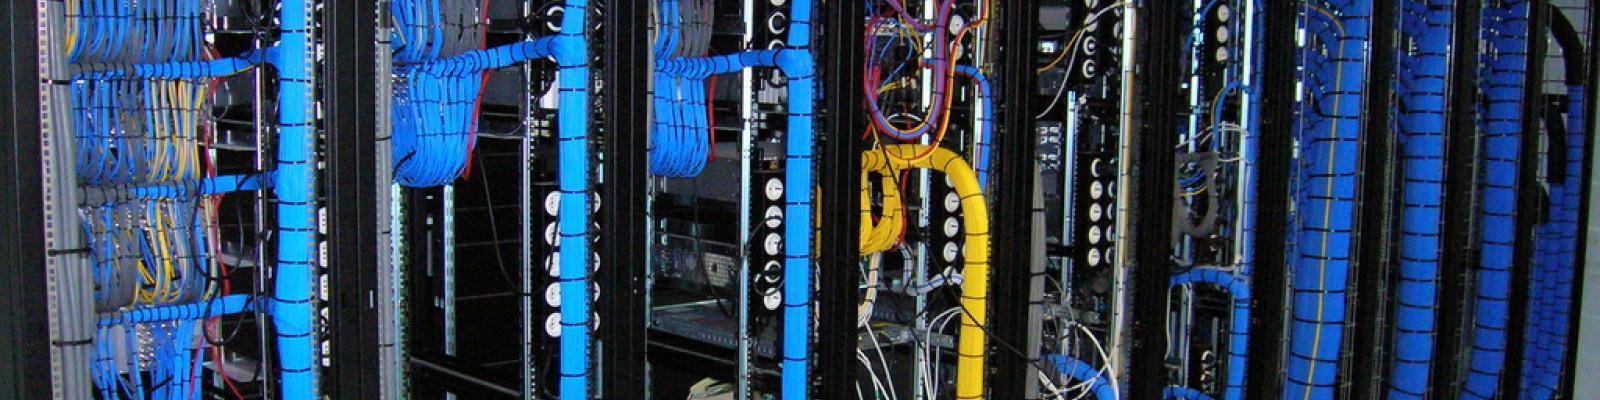 Raduege Calls for Public-Private Cyber Cooperation